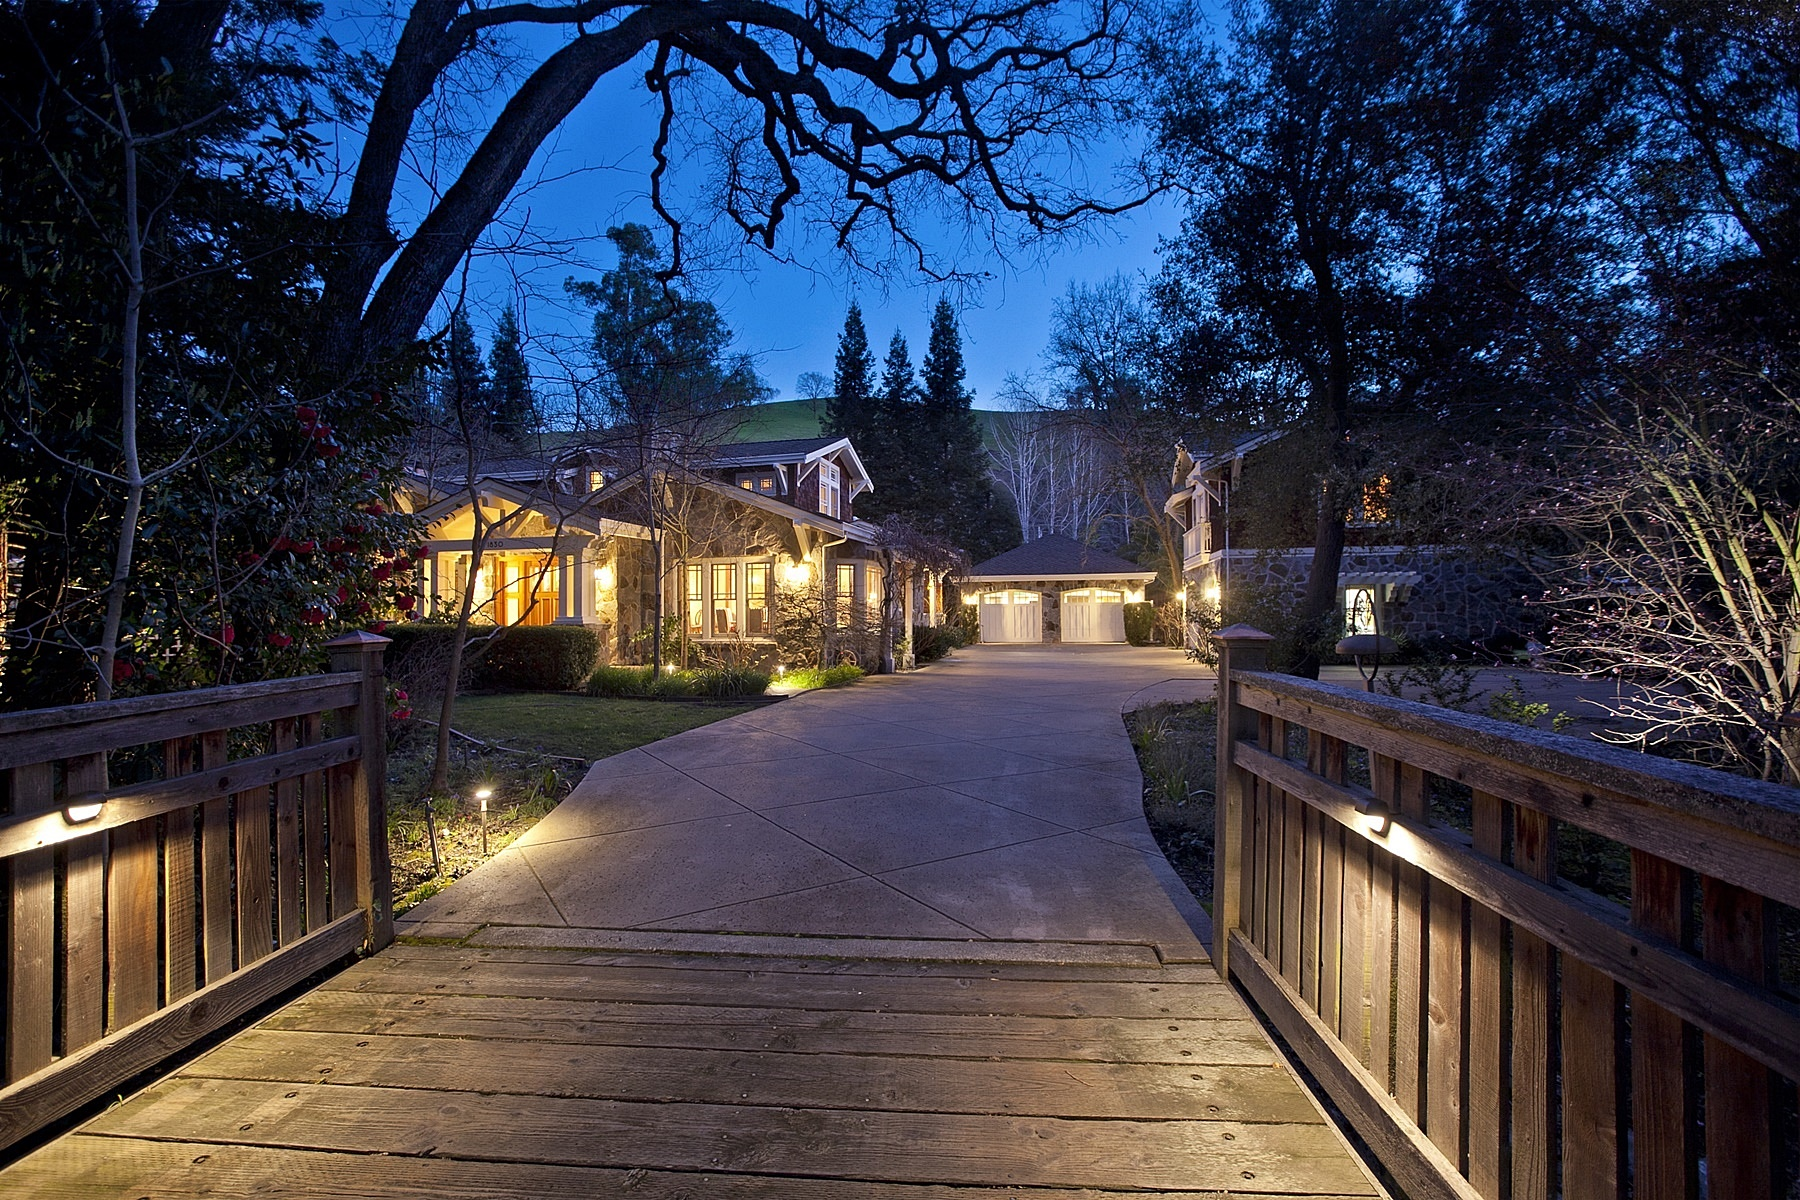 Single Family Home for Sale at Charming Private Estate ~ Diablo Country Club 1830 Alameda Diablo Diablo, California 94528 United States